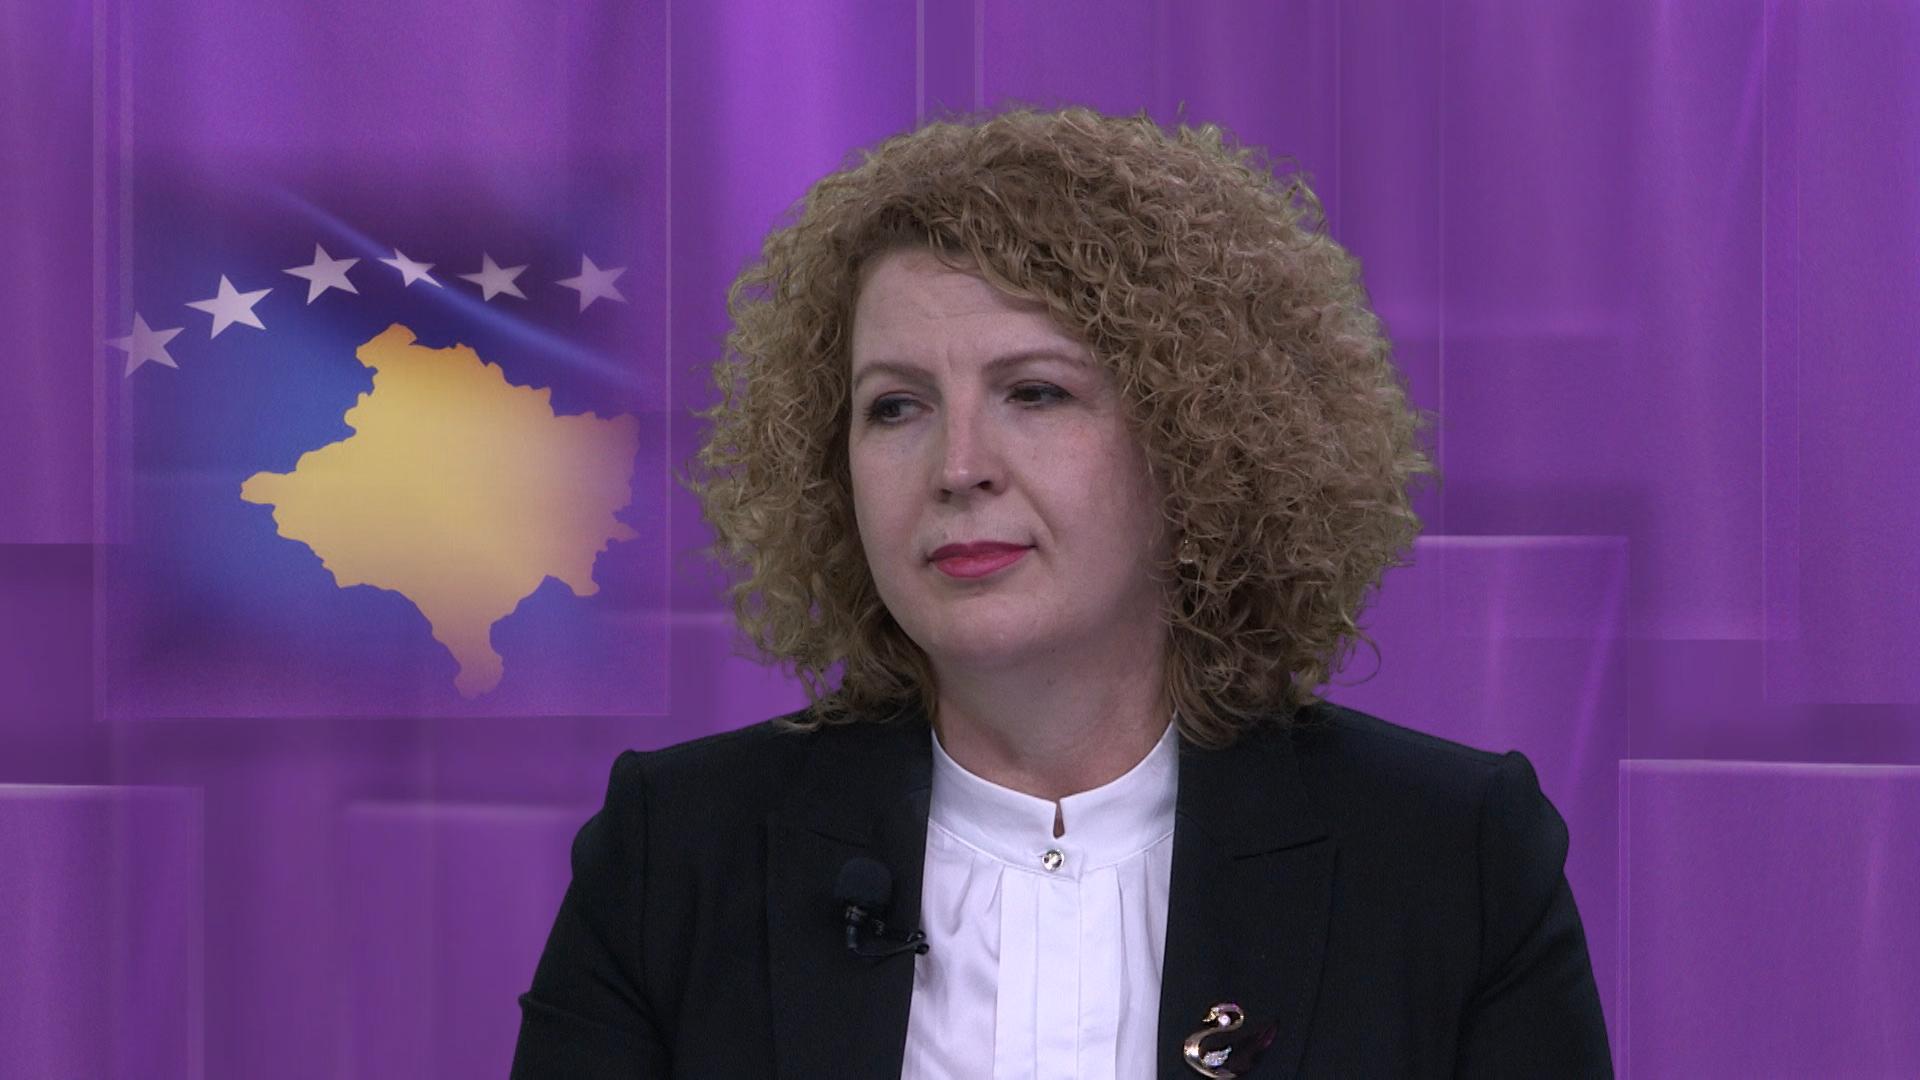 Hajdari: Δεν θα ήθελα να υιοθετήσω άμεσα μέτρα αμοιβαιότητας